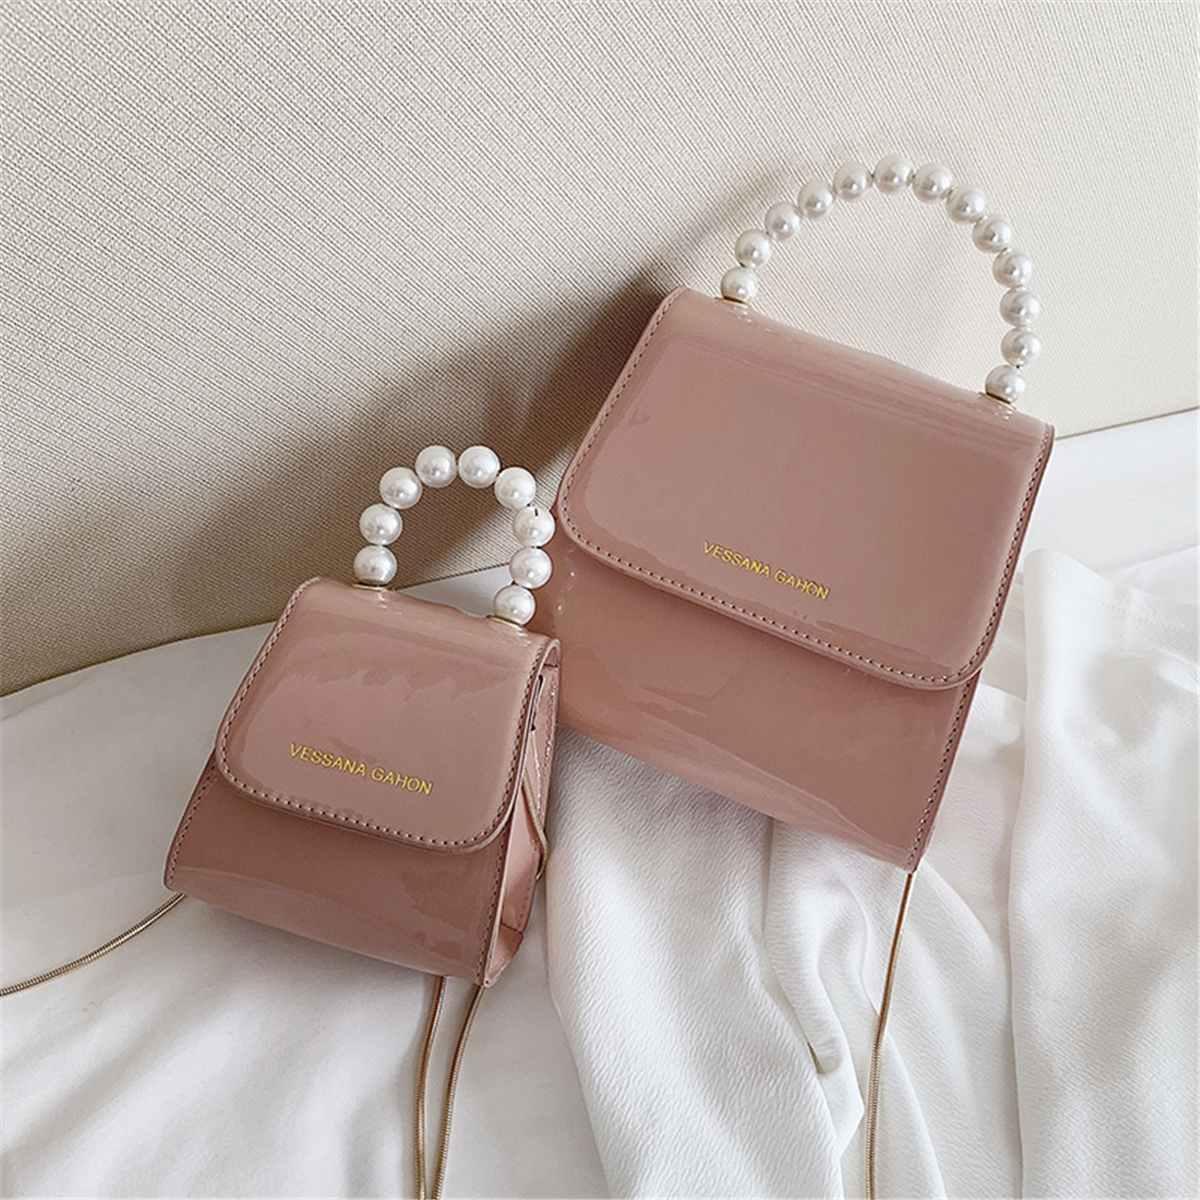 Girls Evening Crossbody Bags Mini Cute Tote Fashion Pearl Handle Chain Bag Women Shoulder Bag PU Leather Handbag Feminine Bolsa